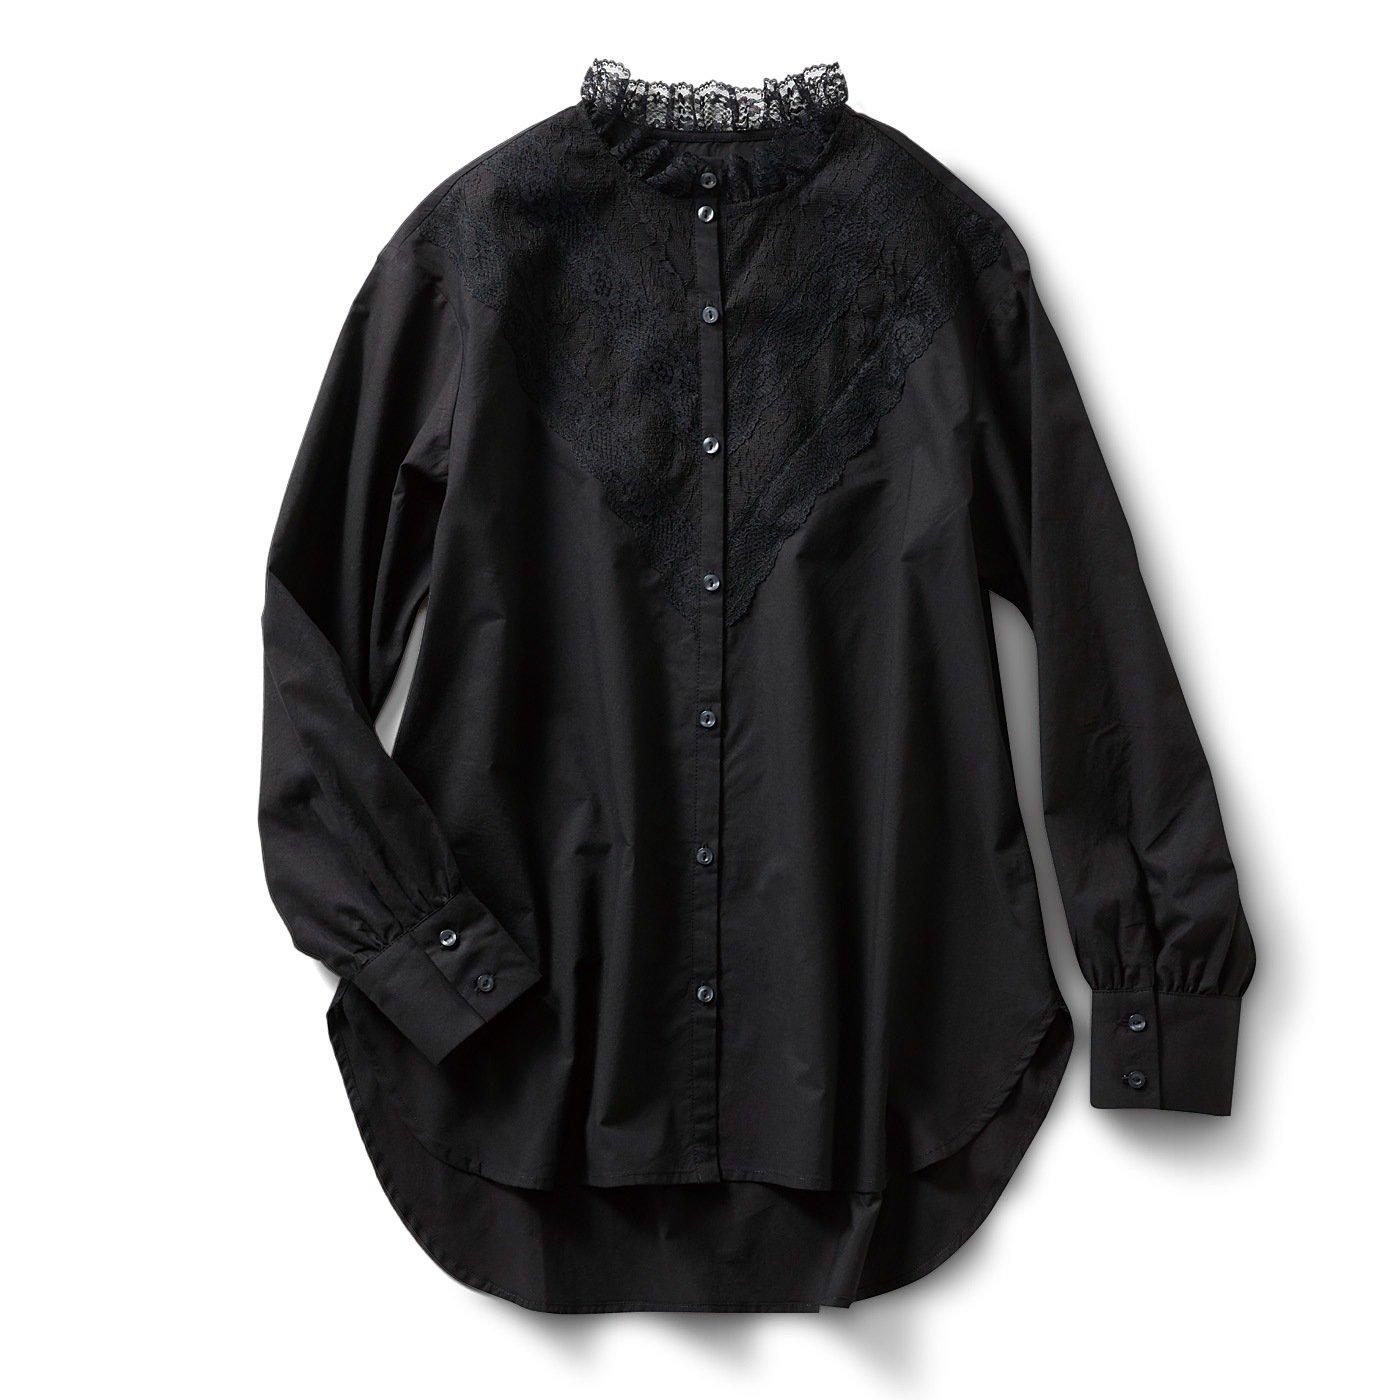 IEDIT[イディット] コットン混のヴィクトリアン調 レースロングブラウス〈ブラック〉